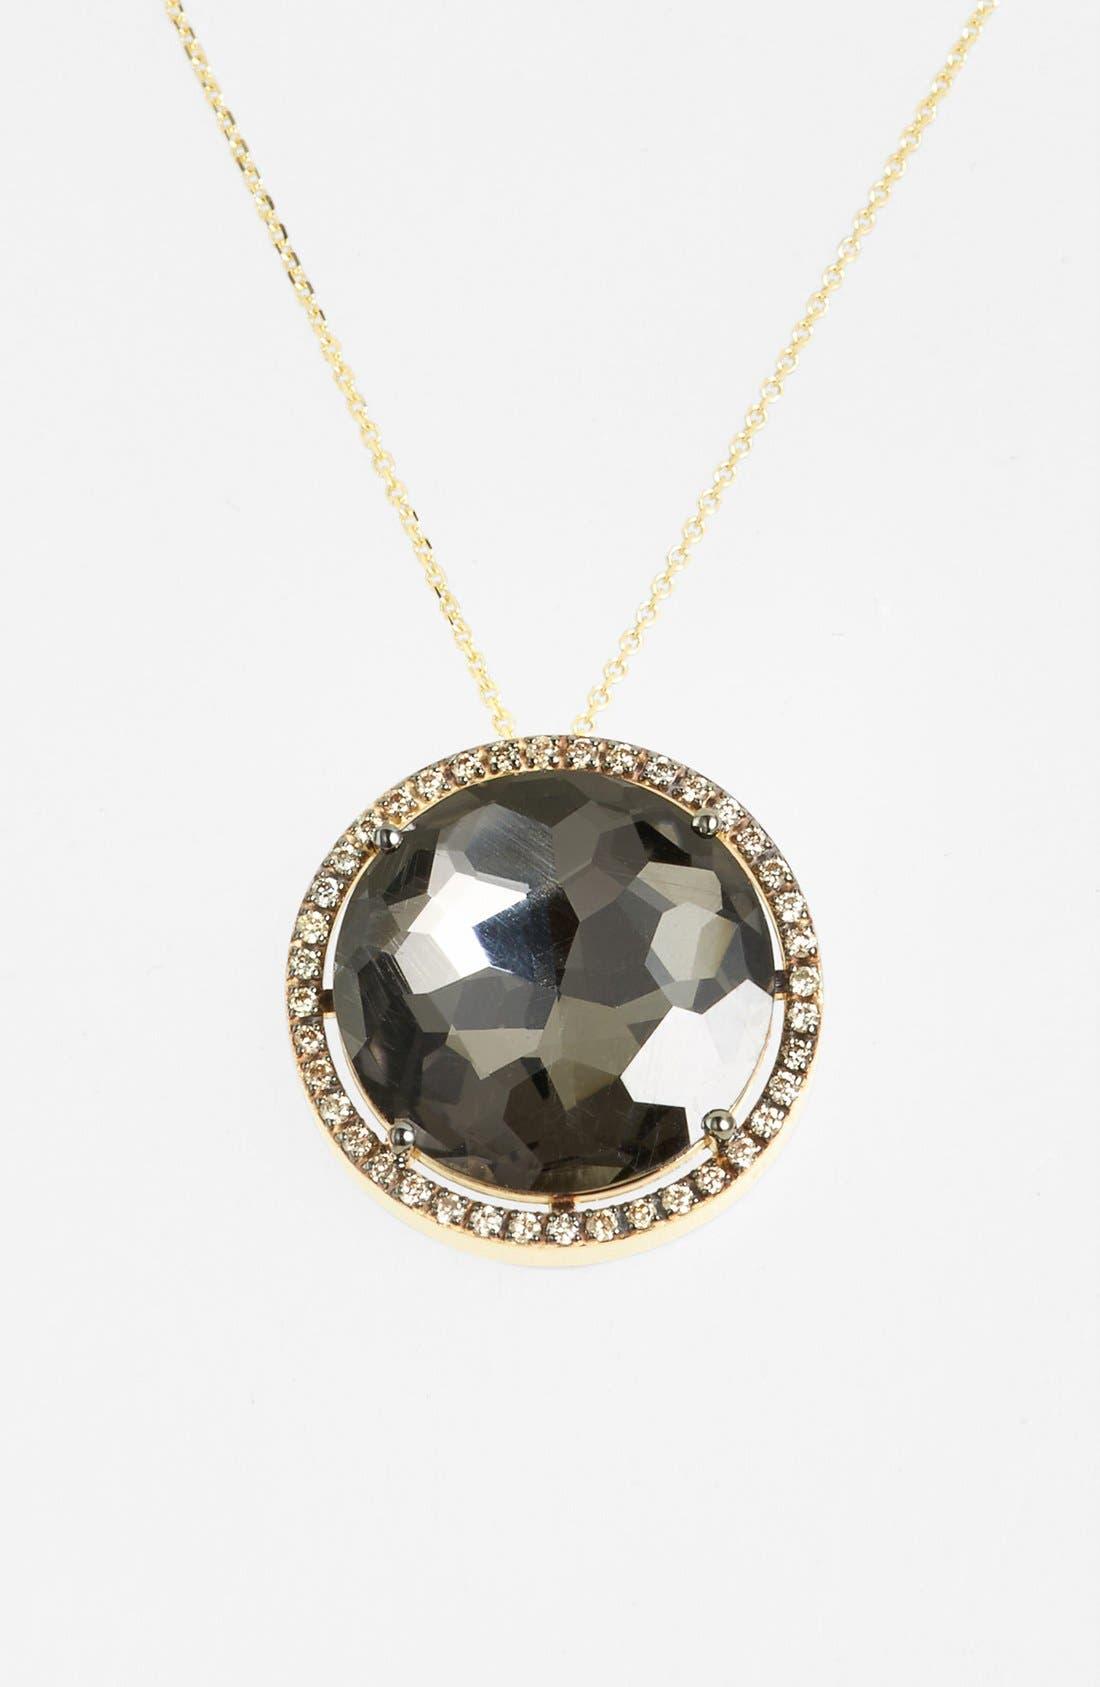 KALAN by Suzanne Kalan Diamond & Stone Pendant Necklace